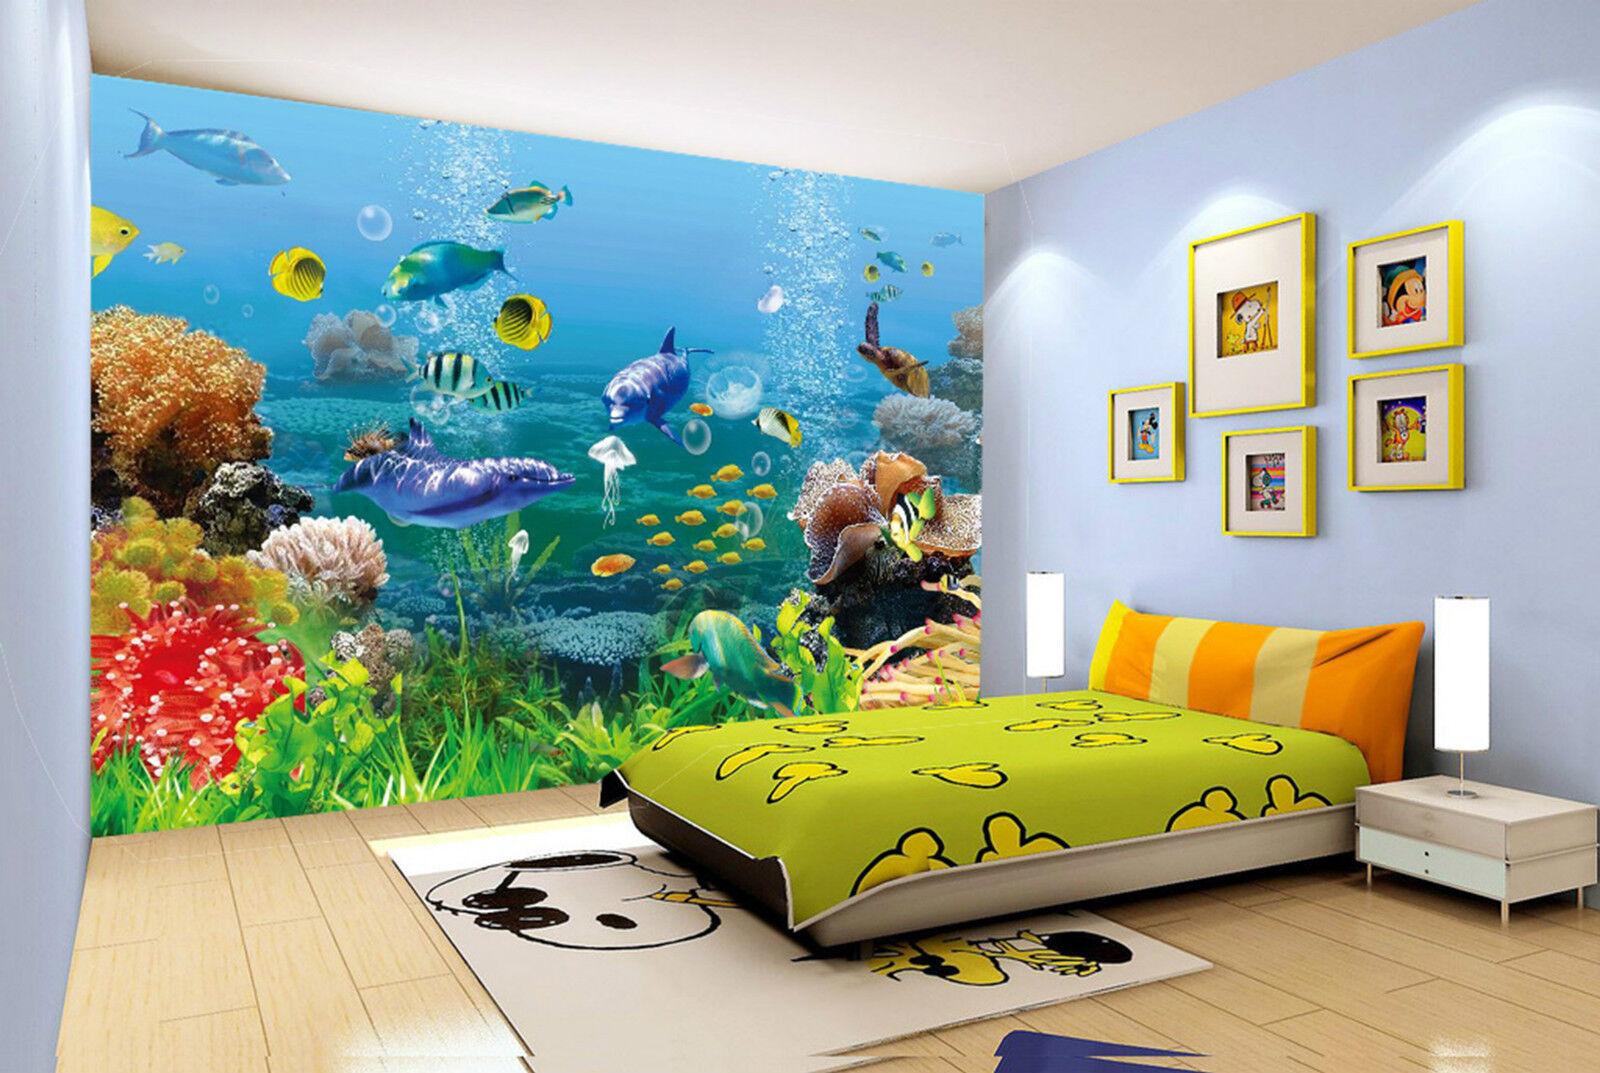 3D Abspielen 477 Fototapeten Wandbild Fototapete Bild Tapete Familie Kinder DE